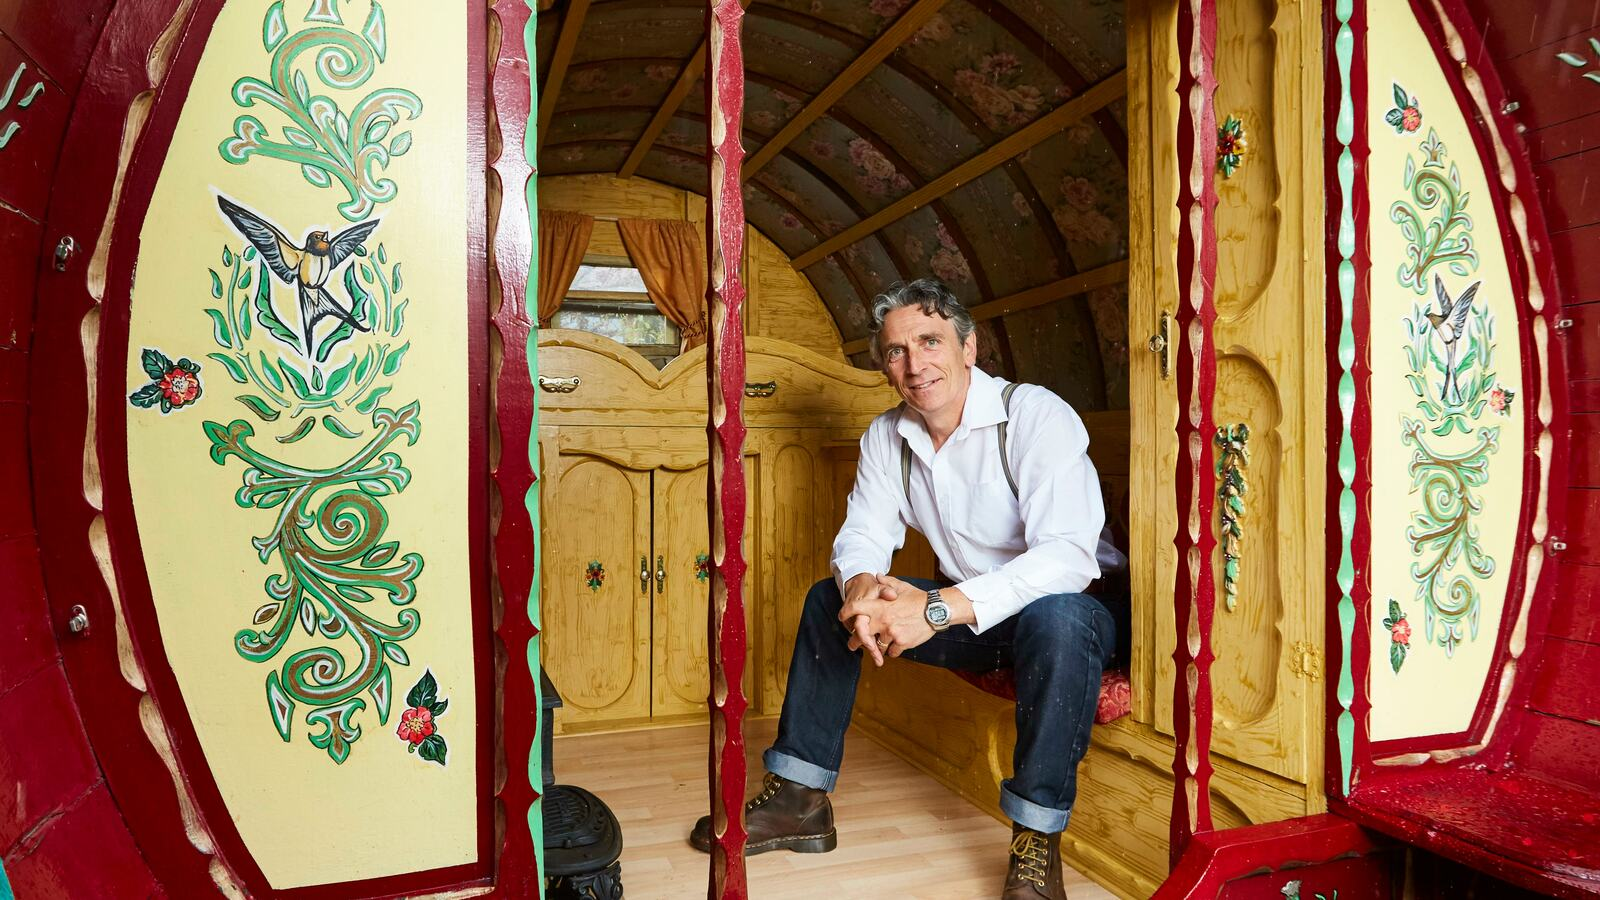 Photo of storyteller Richard O'Neill sitting inside a traditional Romany caravan